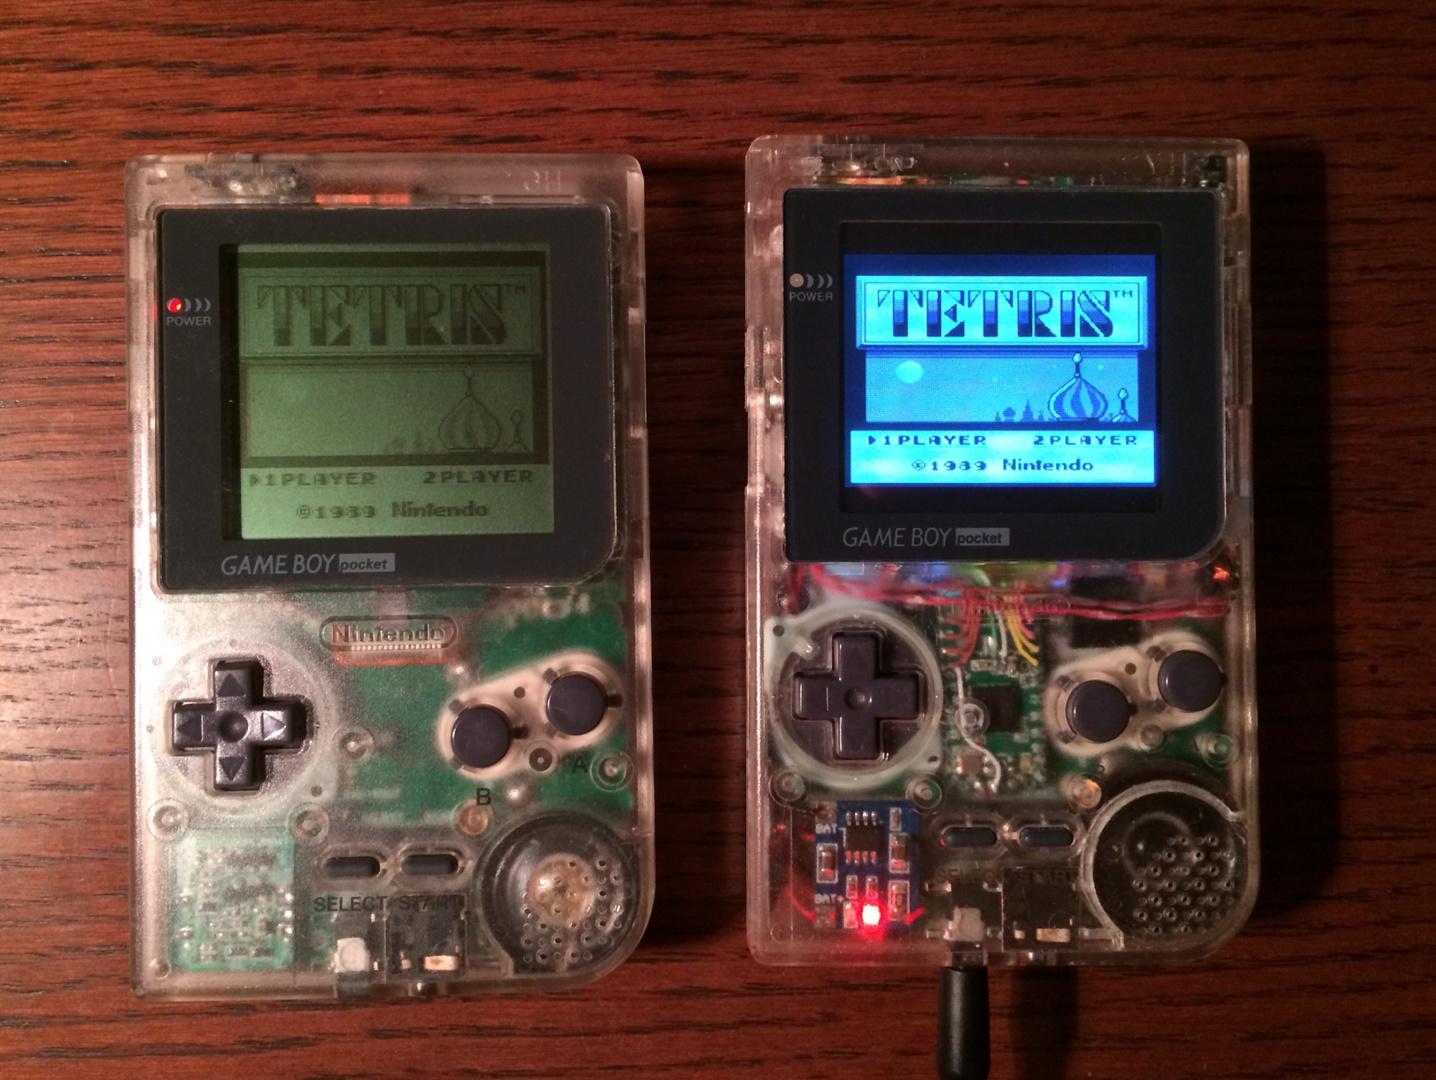 Der Pi Pocket im Gewand des Game Boy Pocket